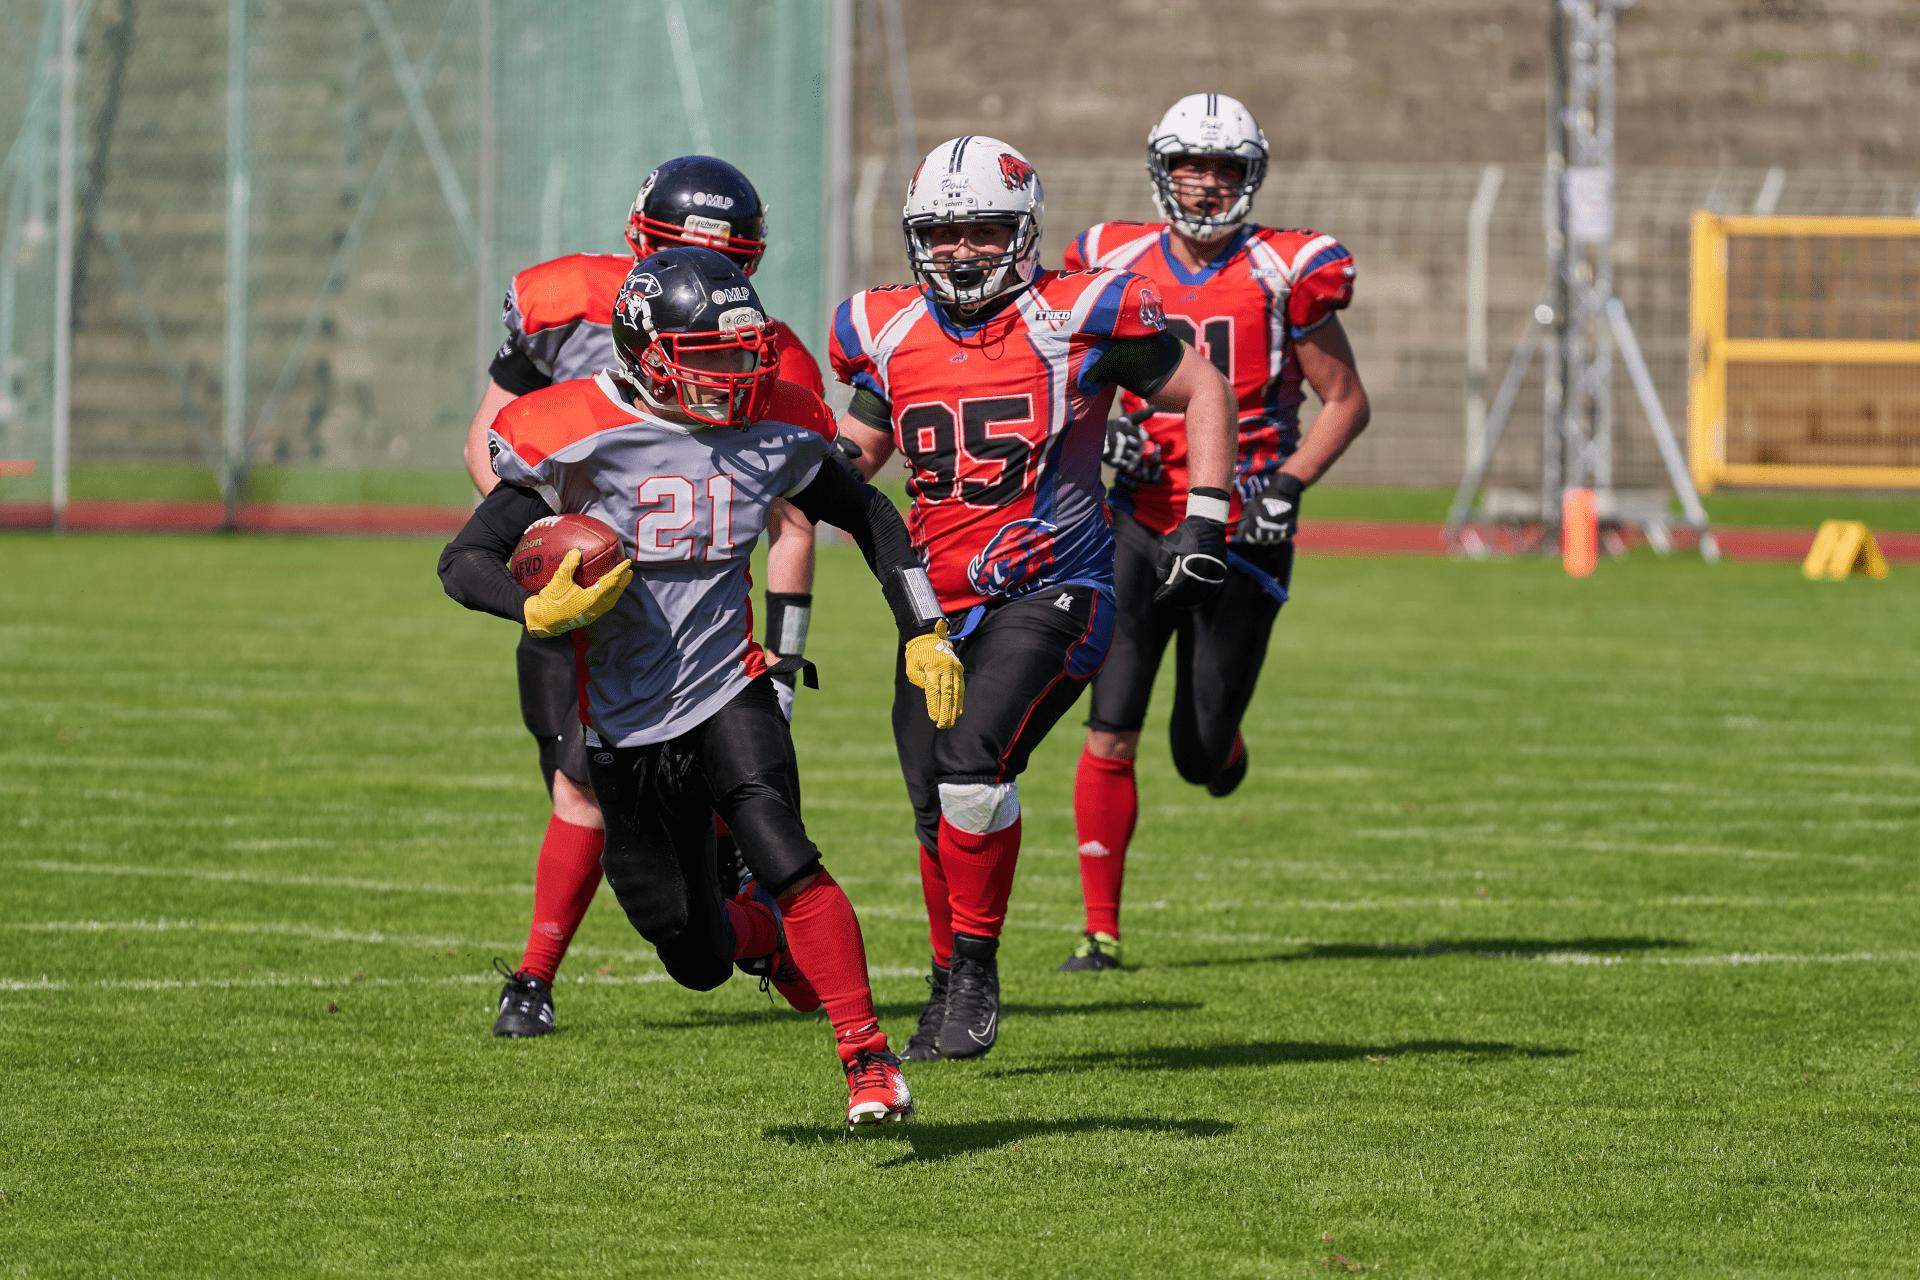 Konstanz Pirates - American Football - Runningback_21